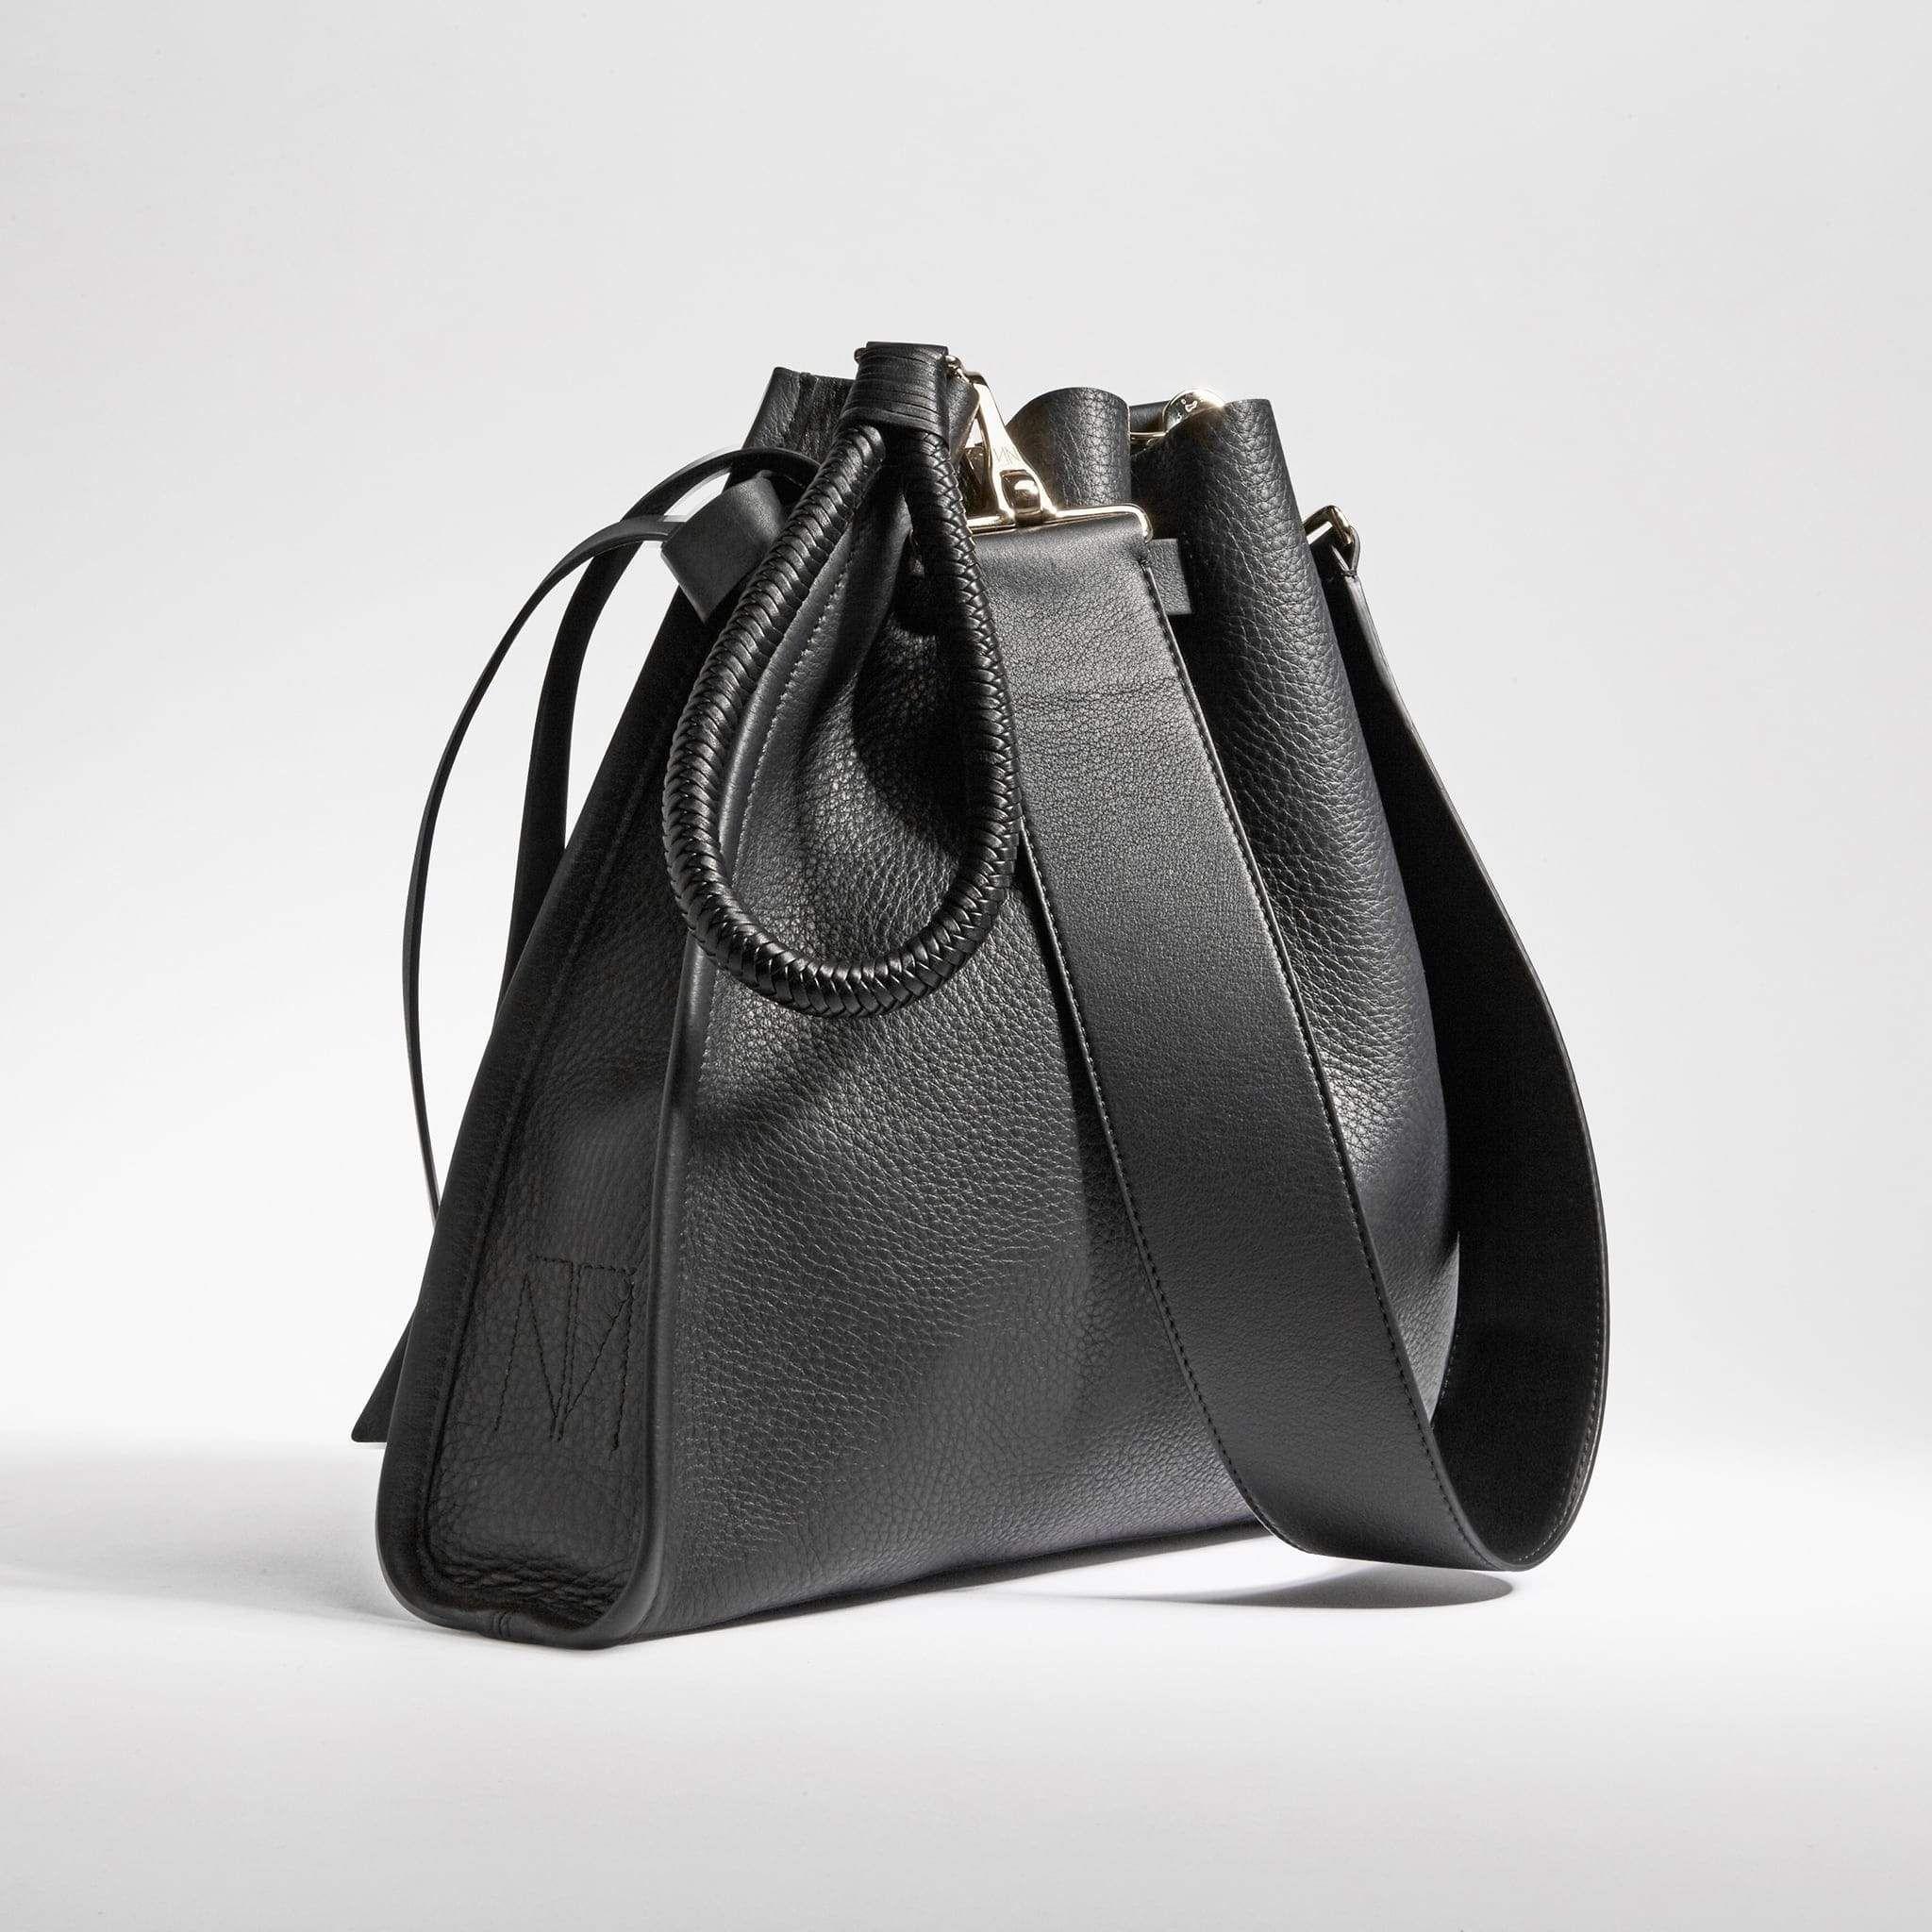 09cd62ef88 Kiss Bag - Vitello | Handbags | Purse handles, Leather pouch, Bags